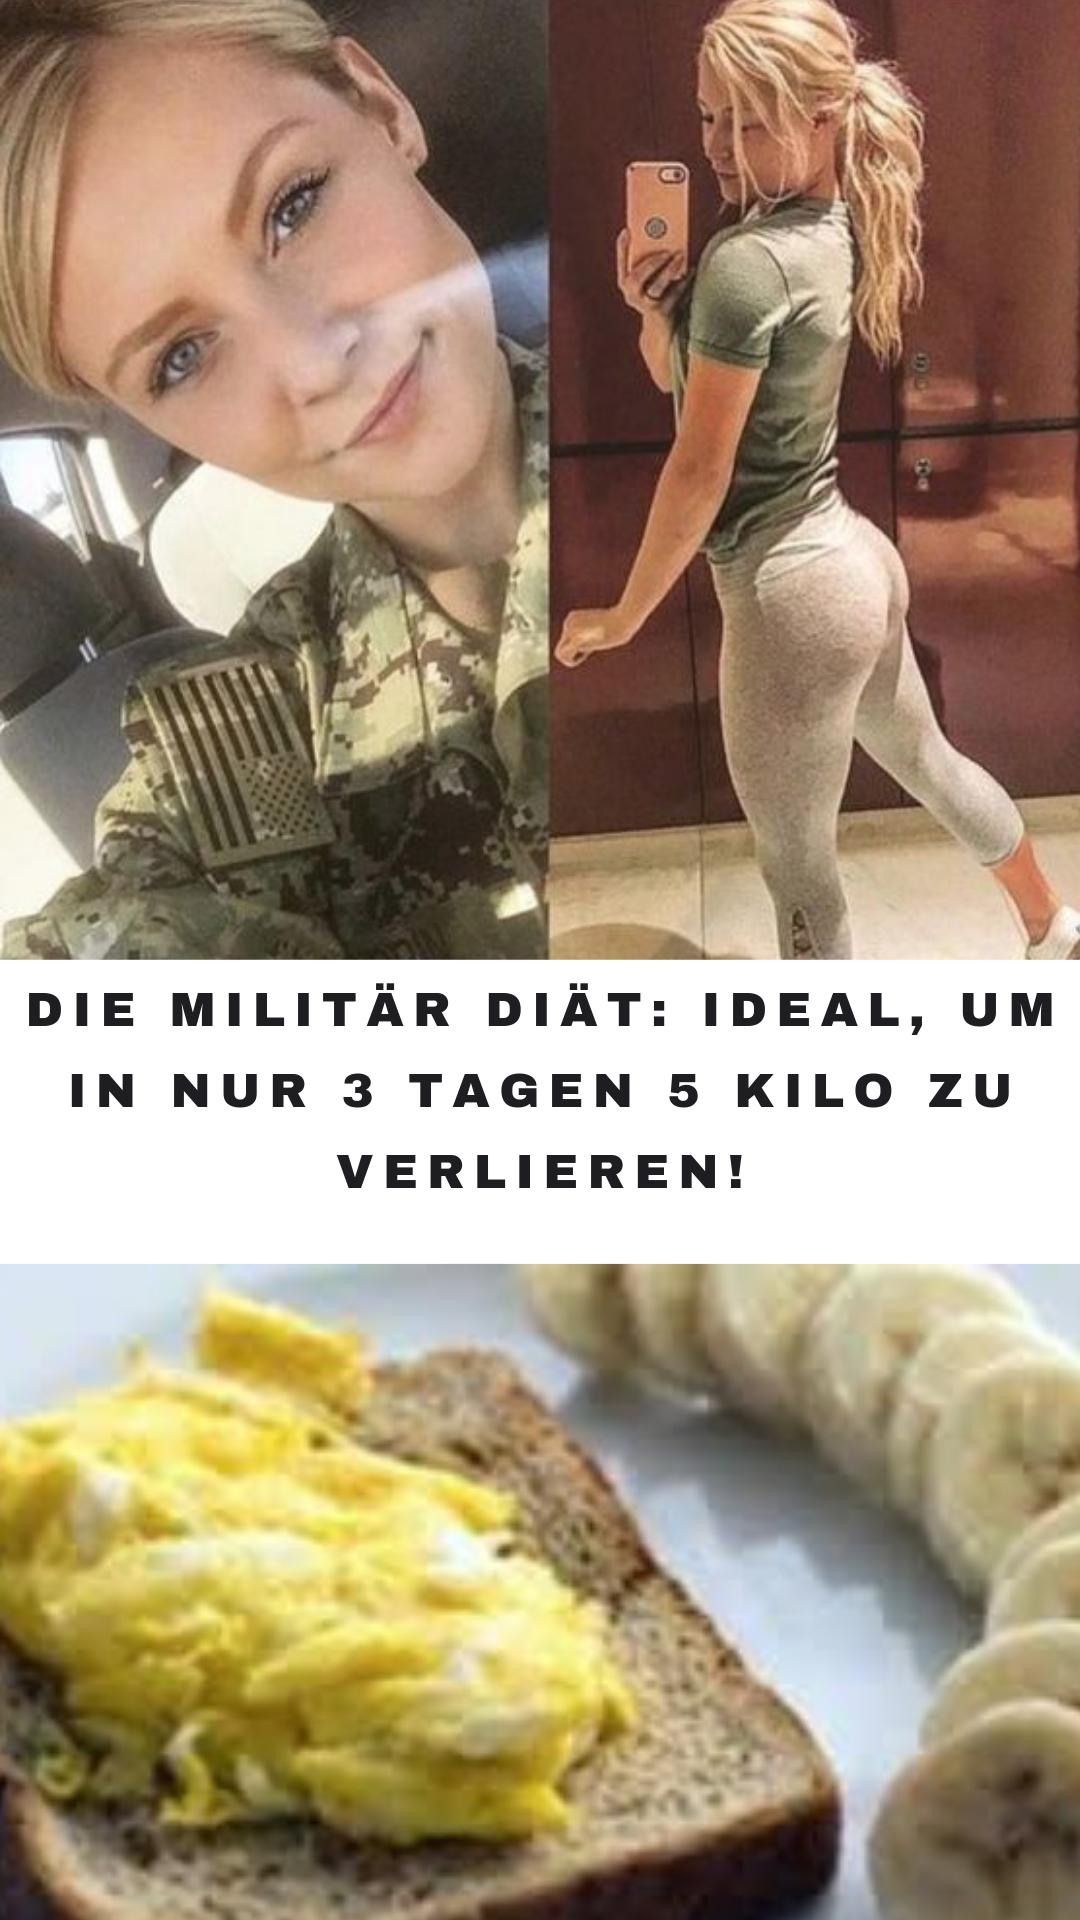 4 Kilo in 3 Tagen Militärdiät verlieren